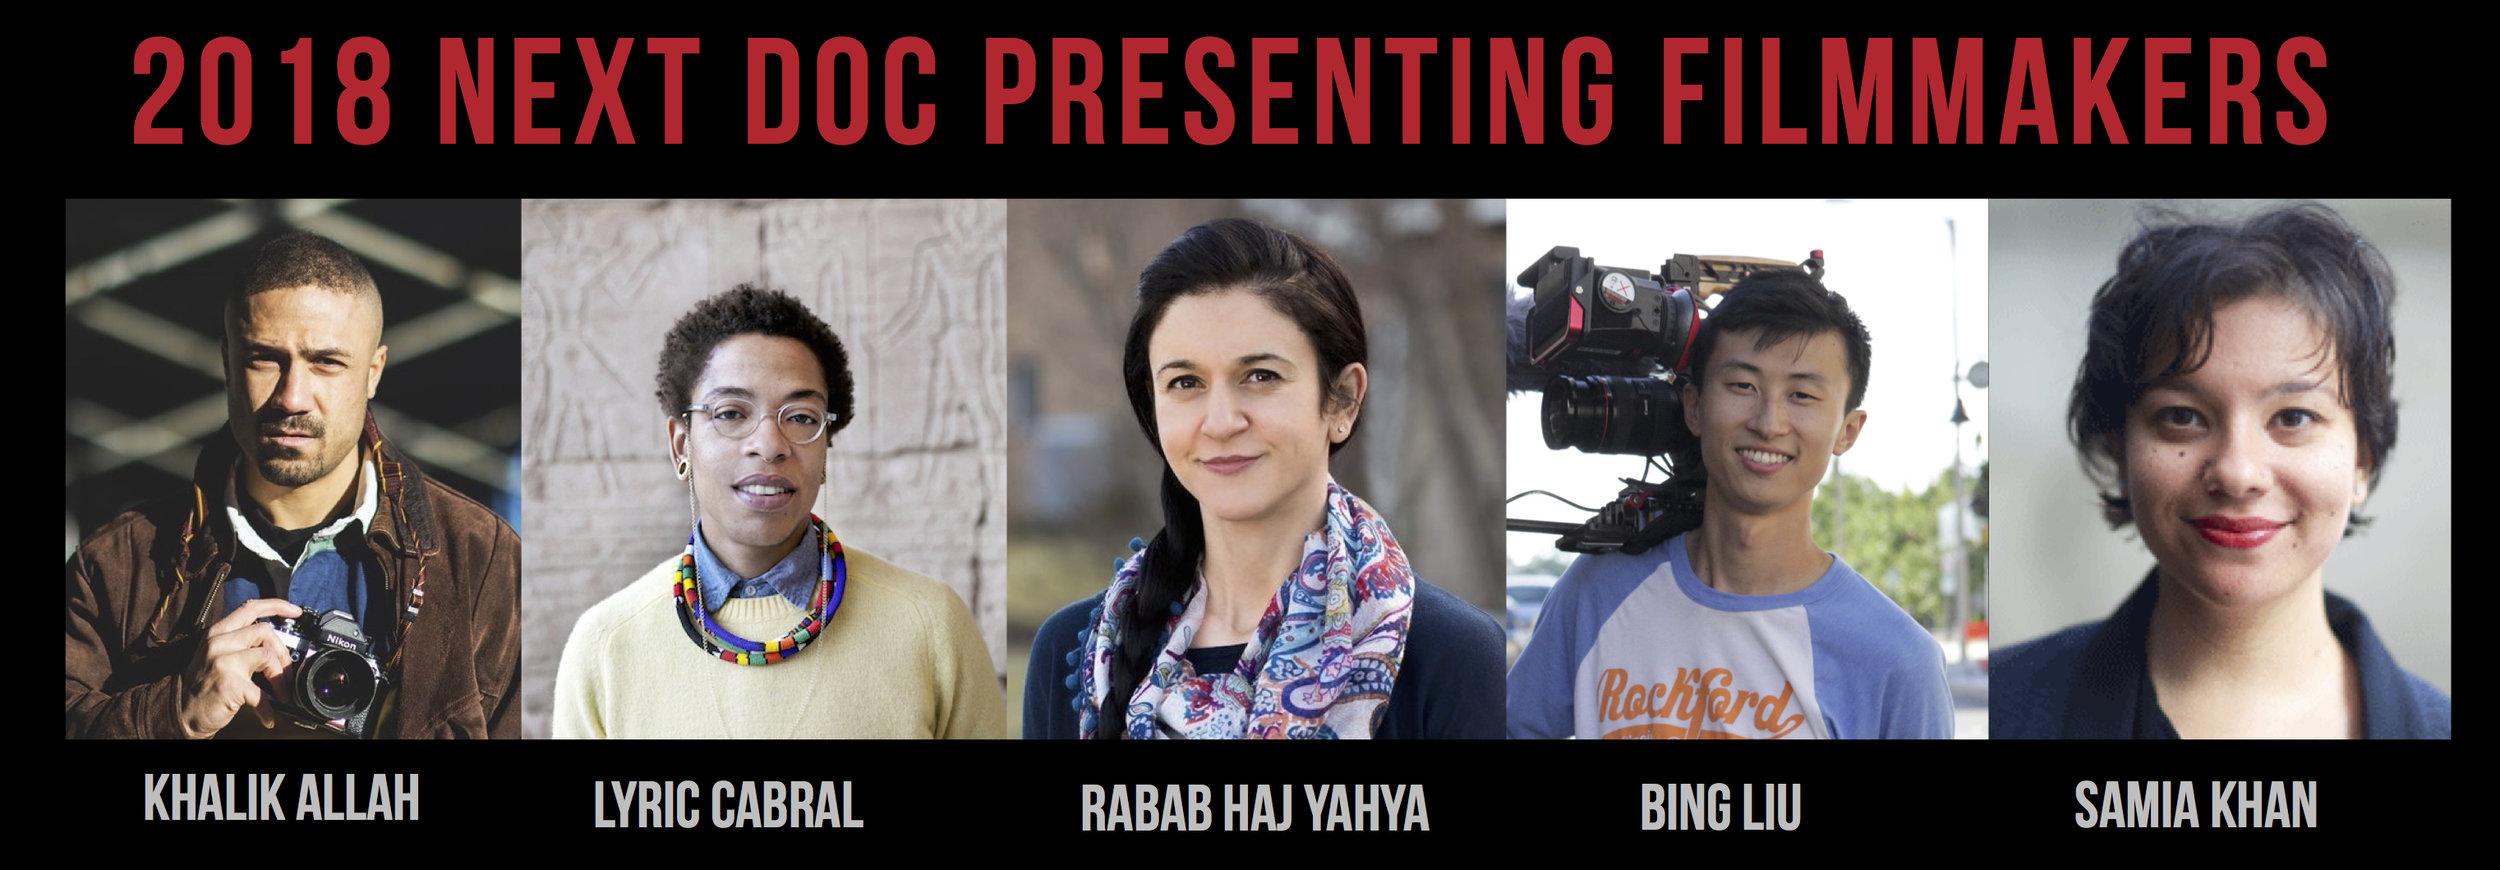 2018 Presenting Filmmakers Image.Forwebsite.jpg